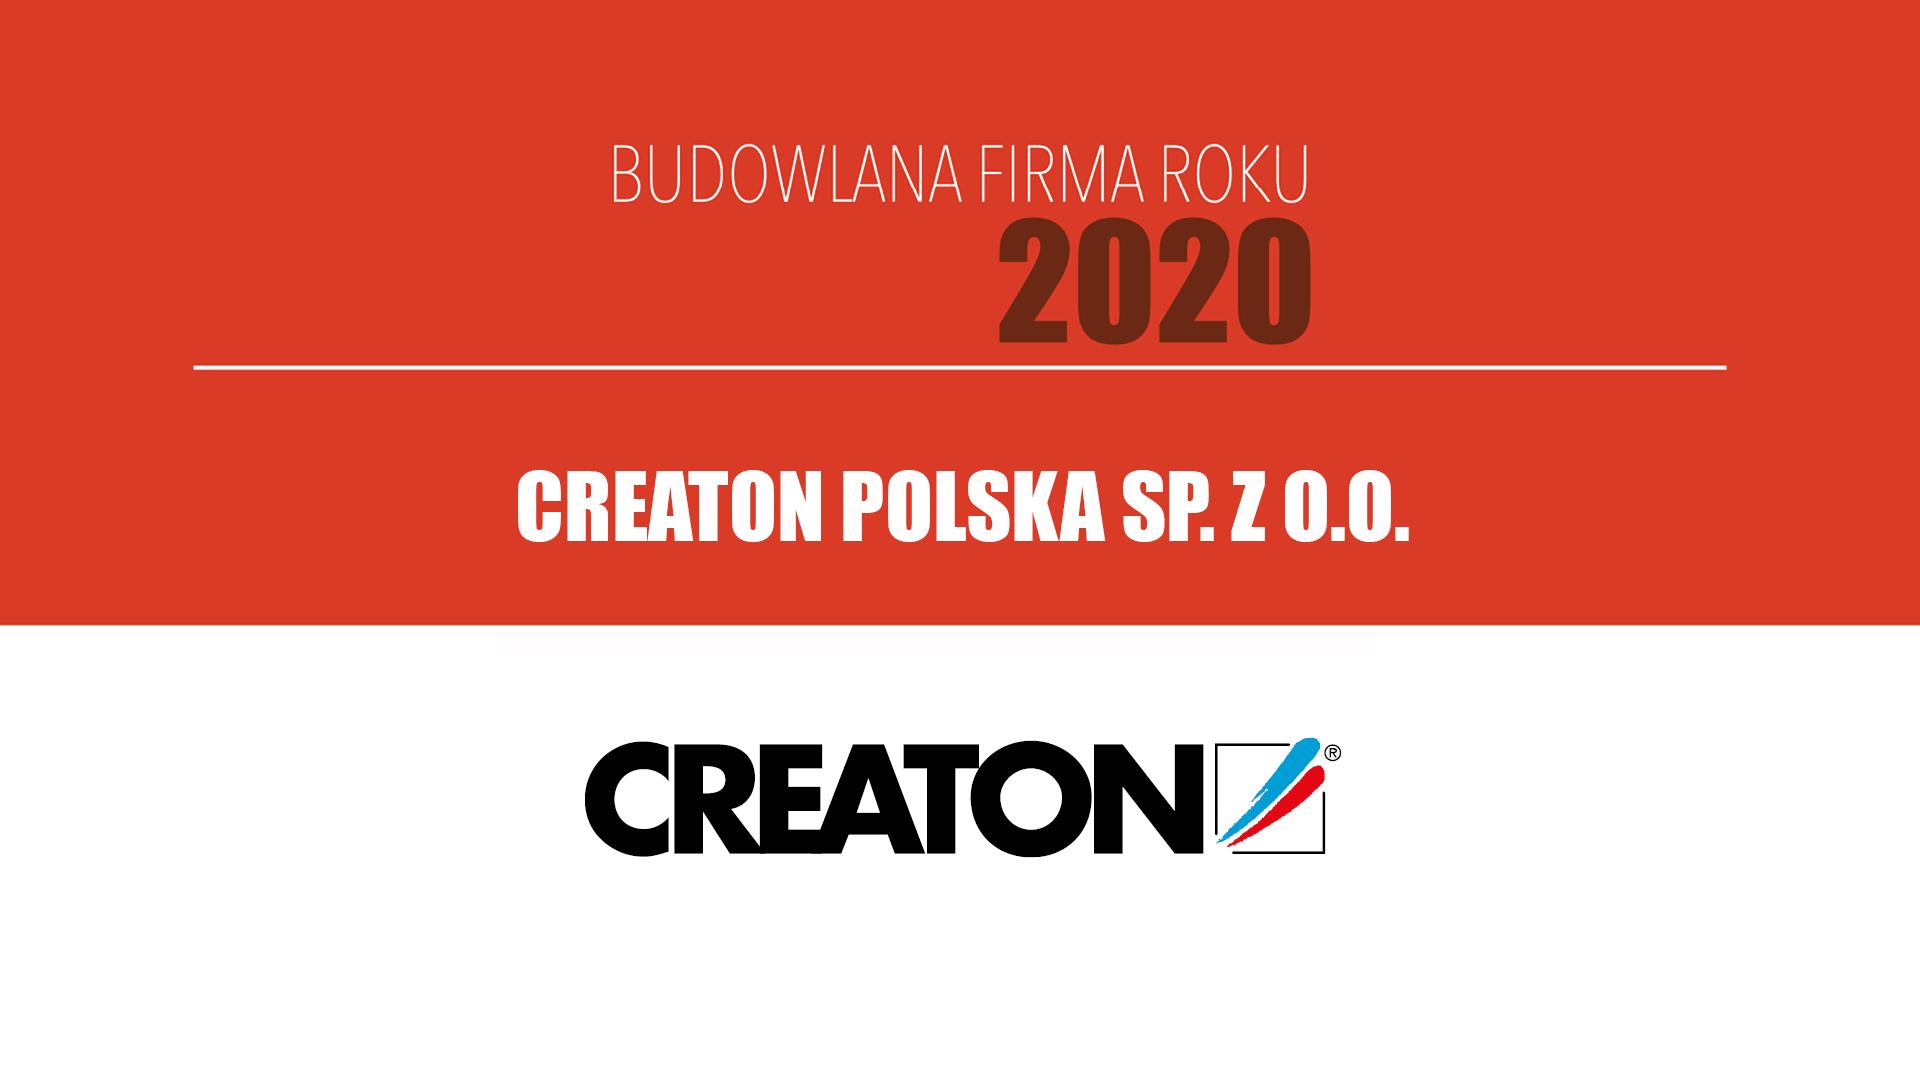 CREATON POLSKA SP. Z O.O. – Budowlana Firma Roku 2020